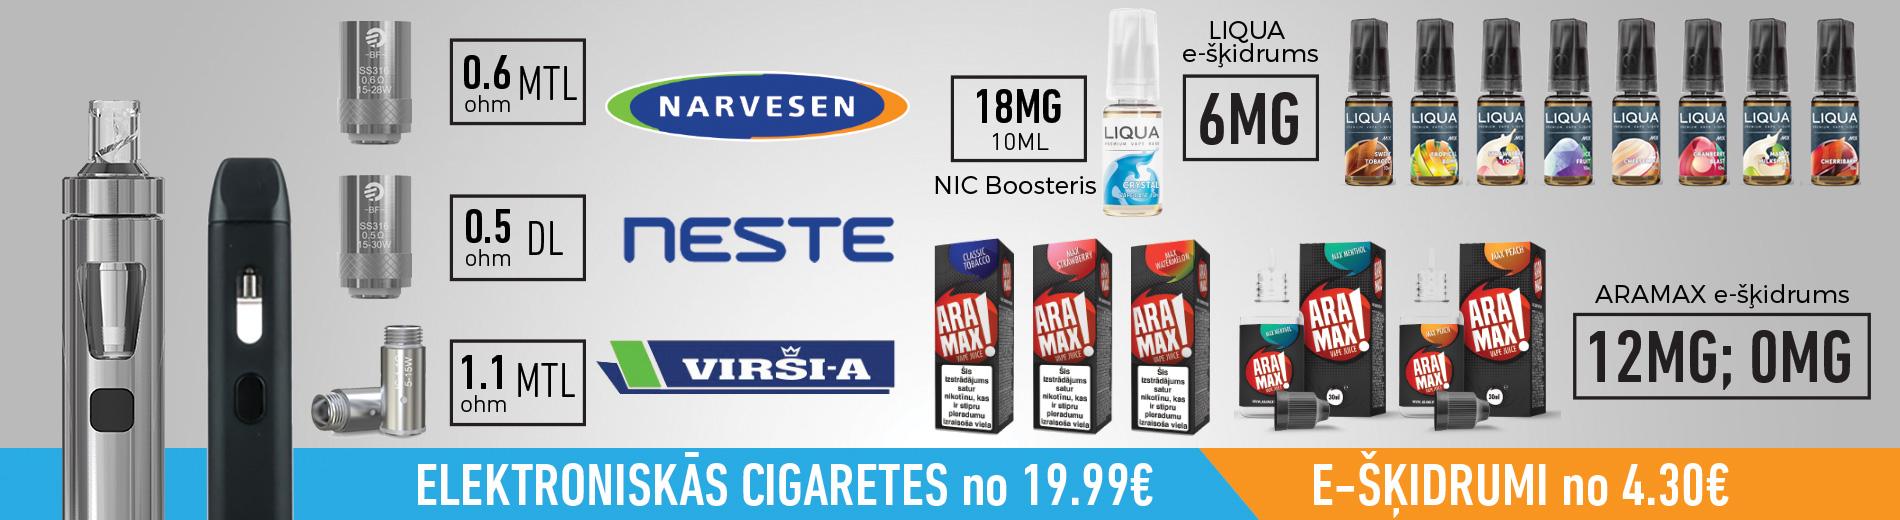 e-cigaretes narvesen, elektroniskās cigaretes neste dus, virši a, airpuf